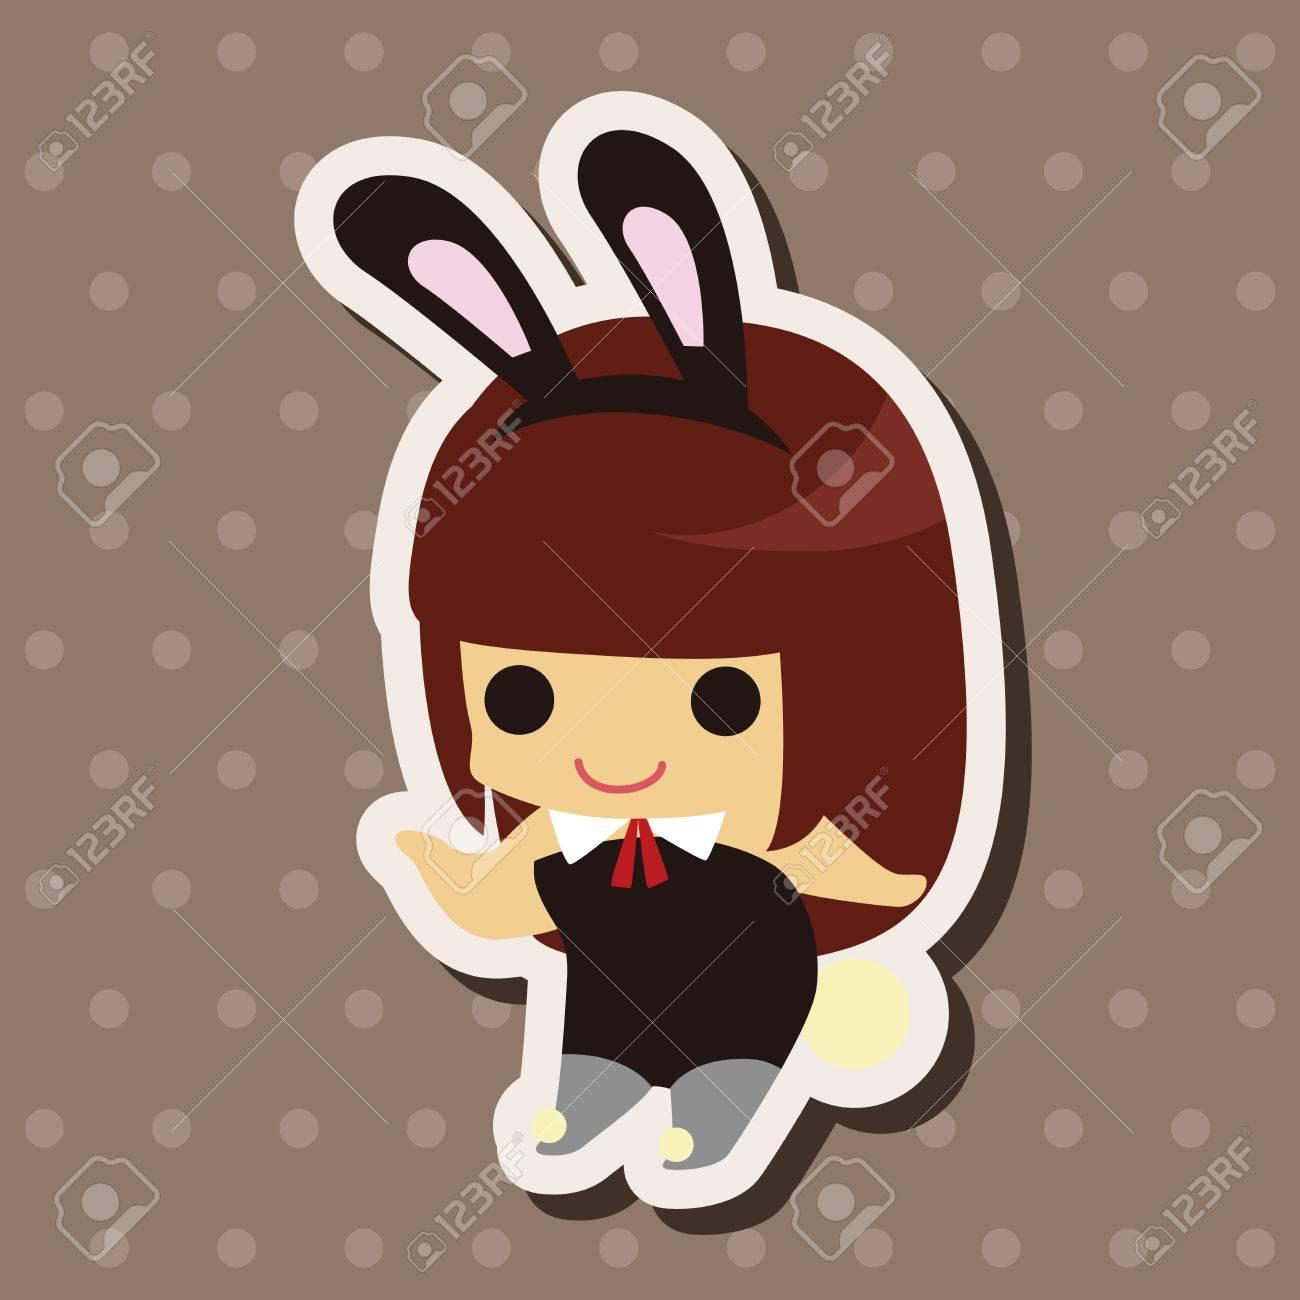 1300x1300 Playboy Bunny Clipart Amp Playboy Bunny Clip Art Images